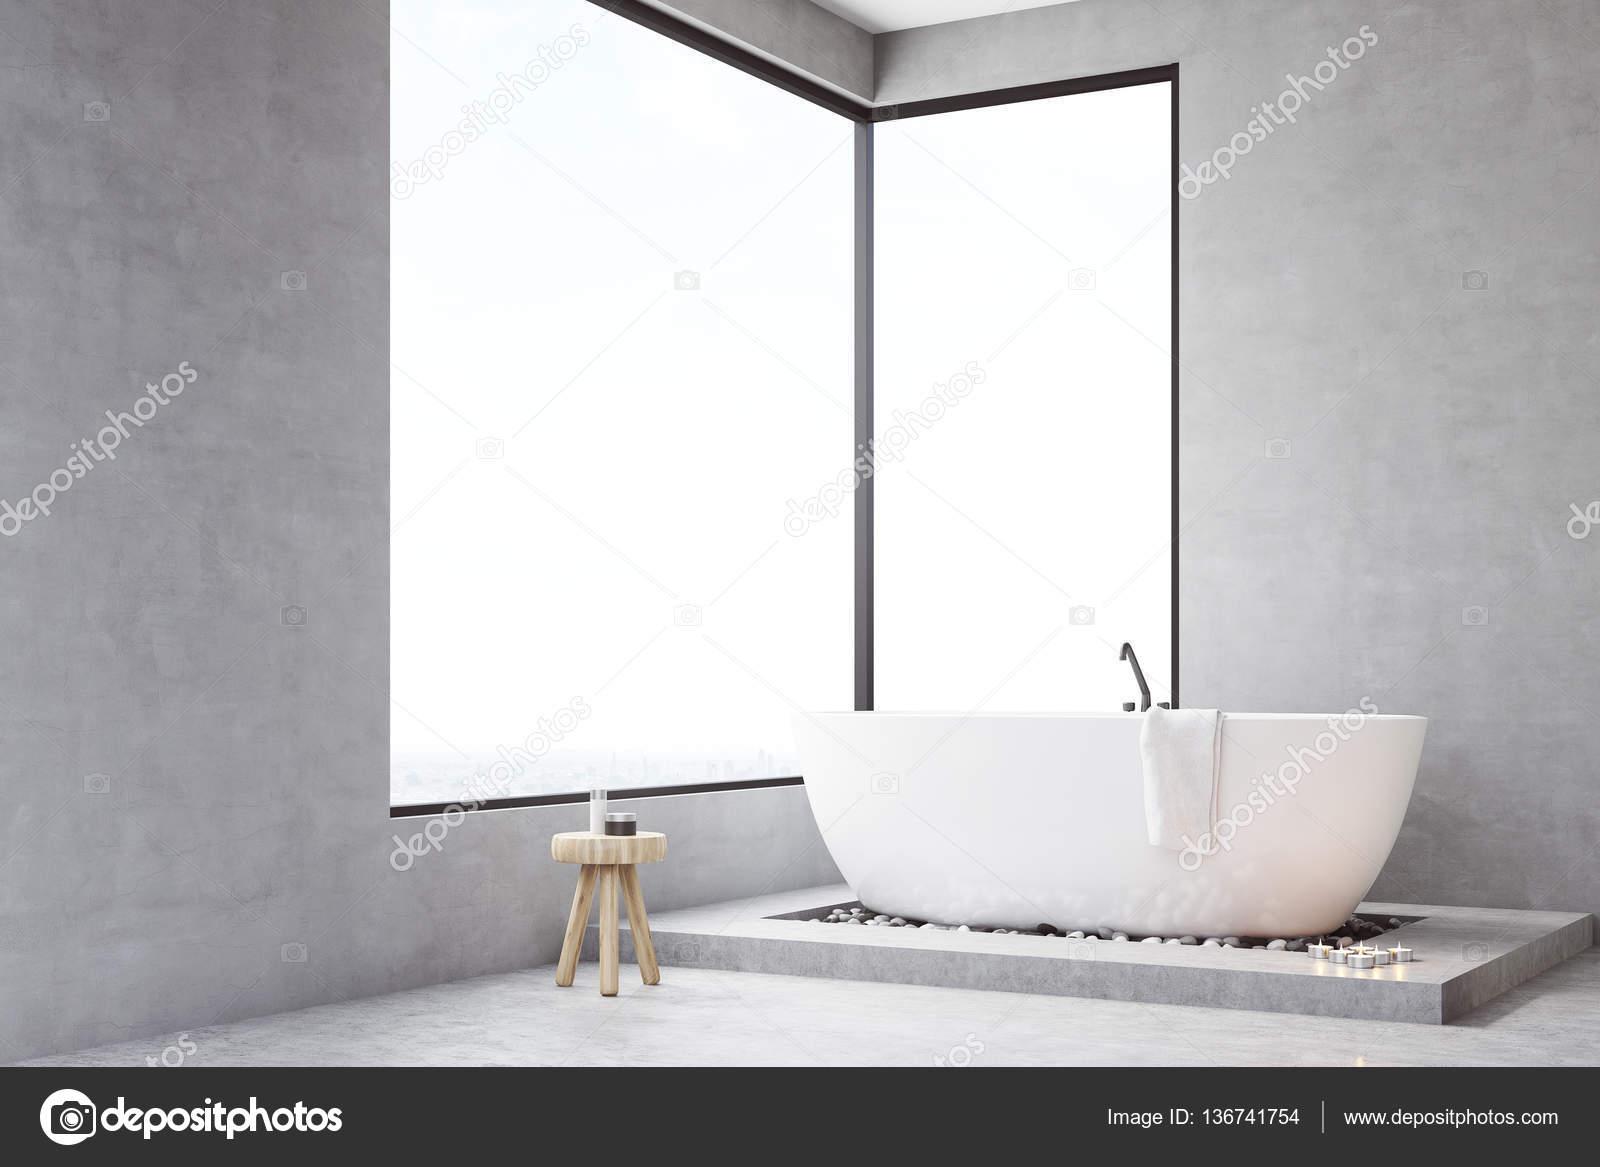 Vasca Da Bagno Rettangolare Grande : Vasca da bagno vetroresina con reha vasca da bagno